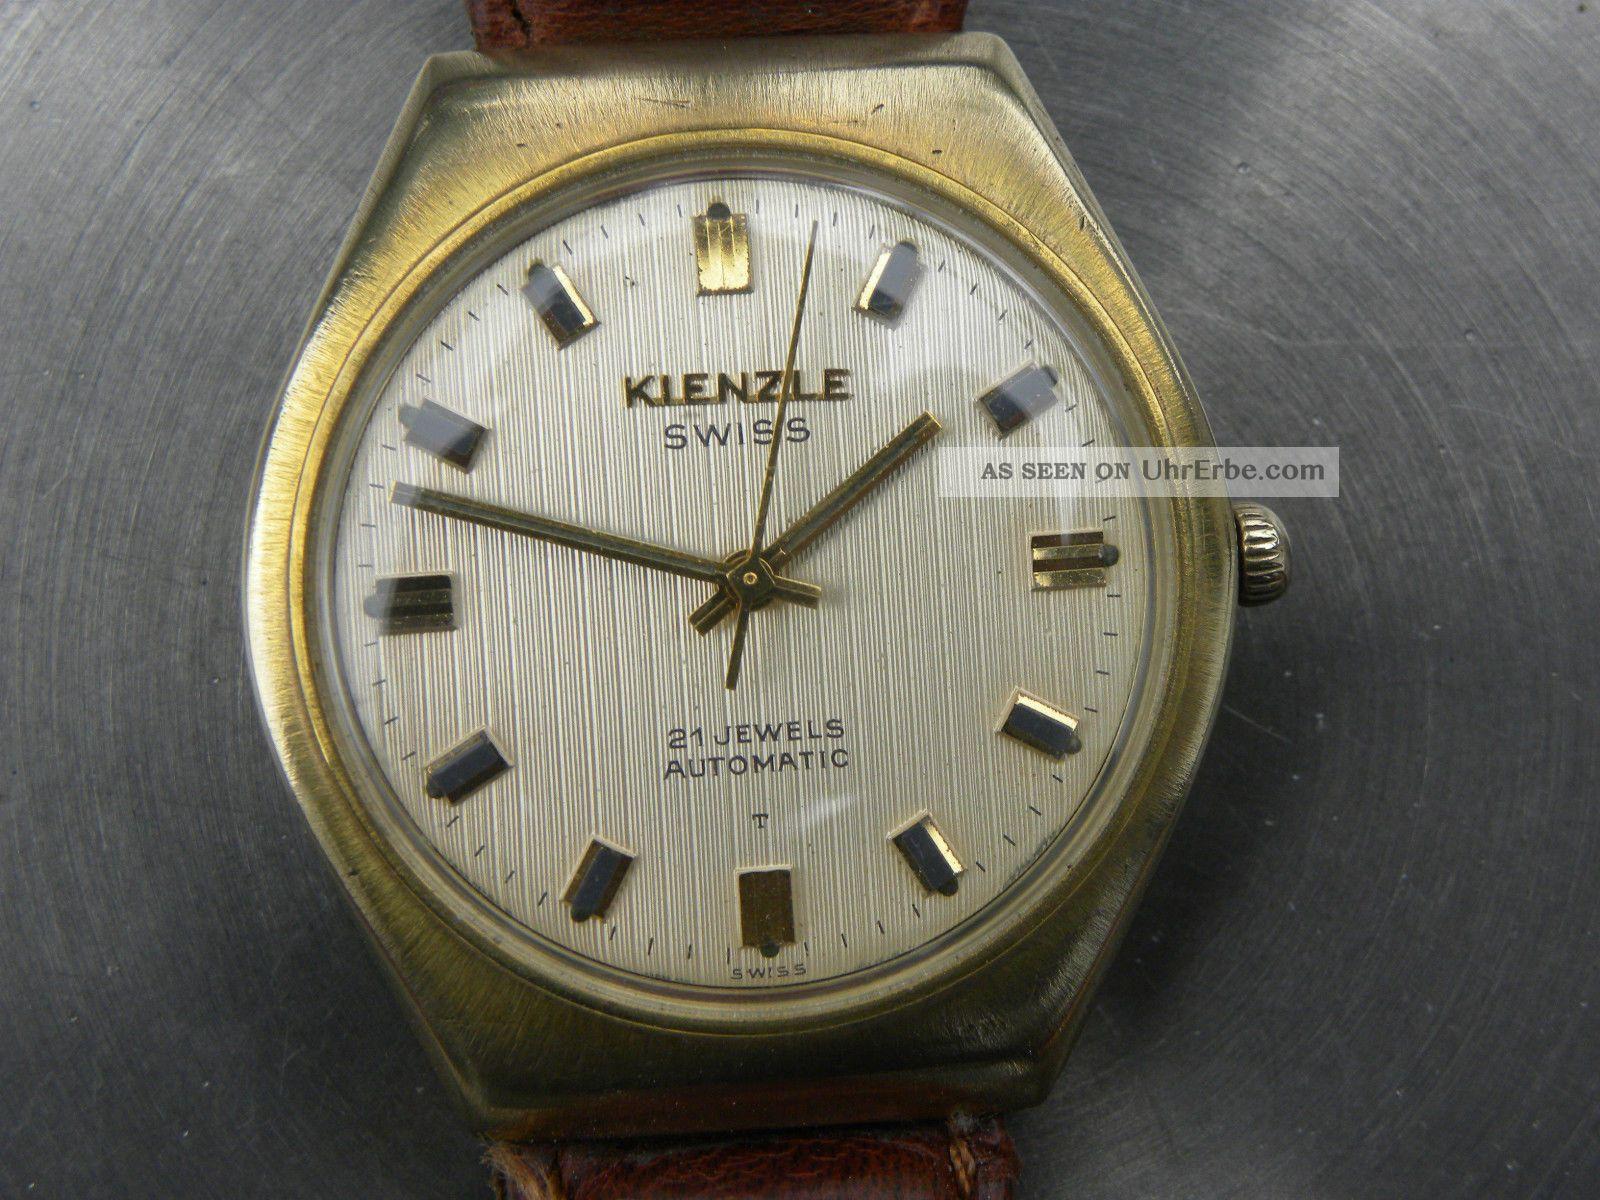 Rar: Kienzle Swiss Automatic Armbanduhren Bild